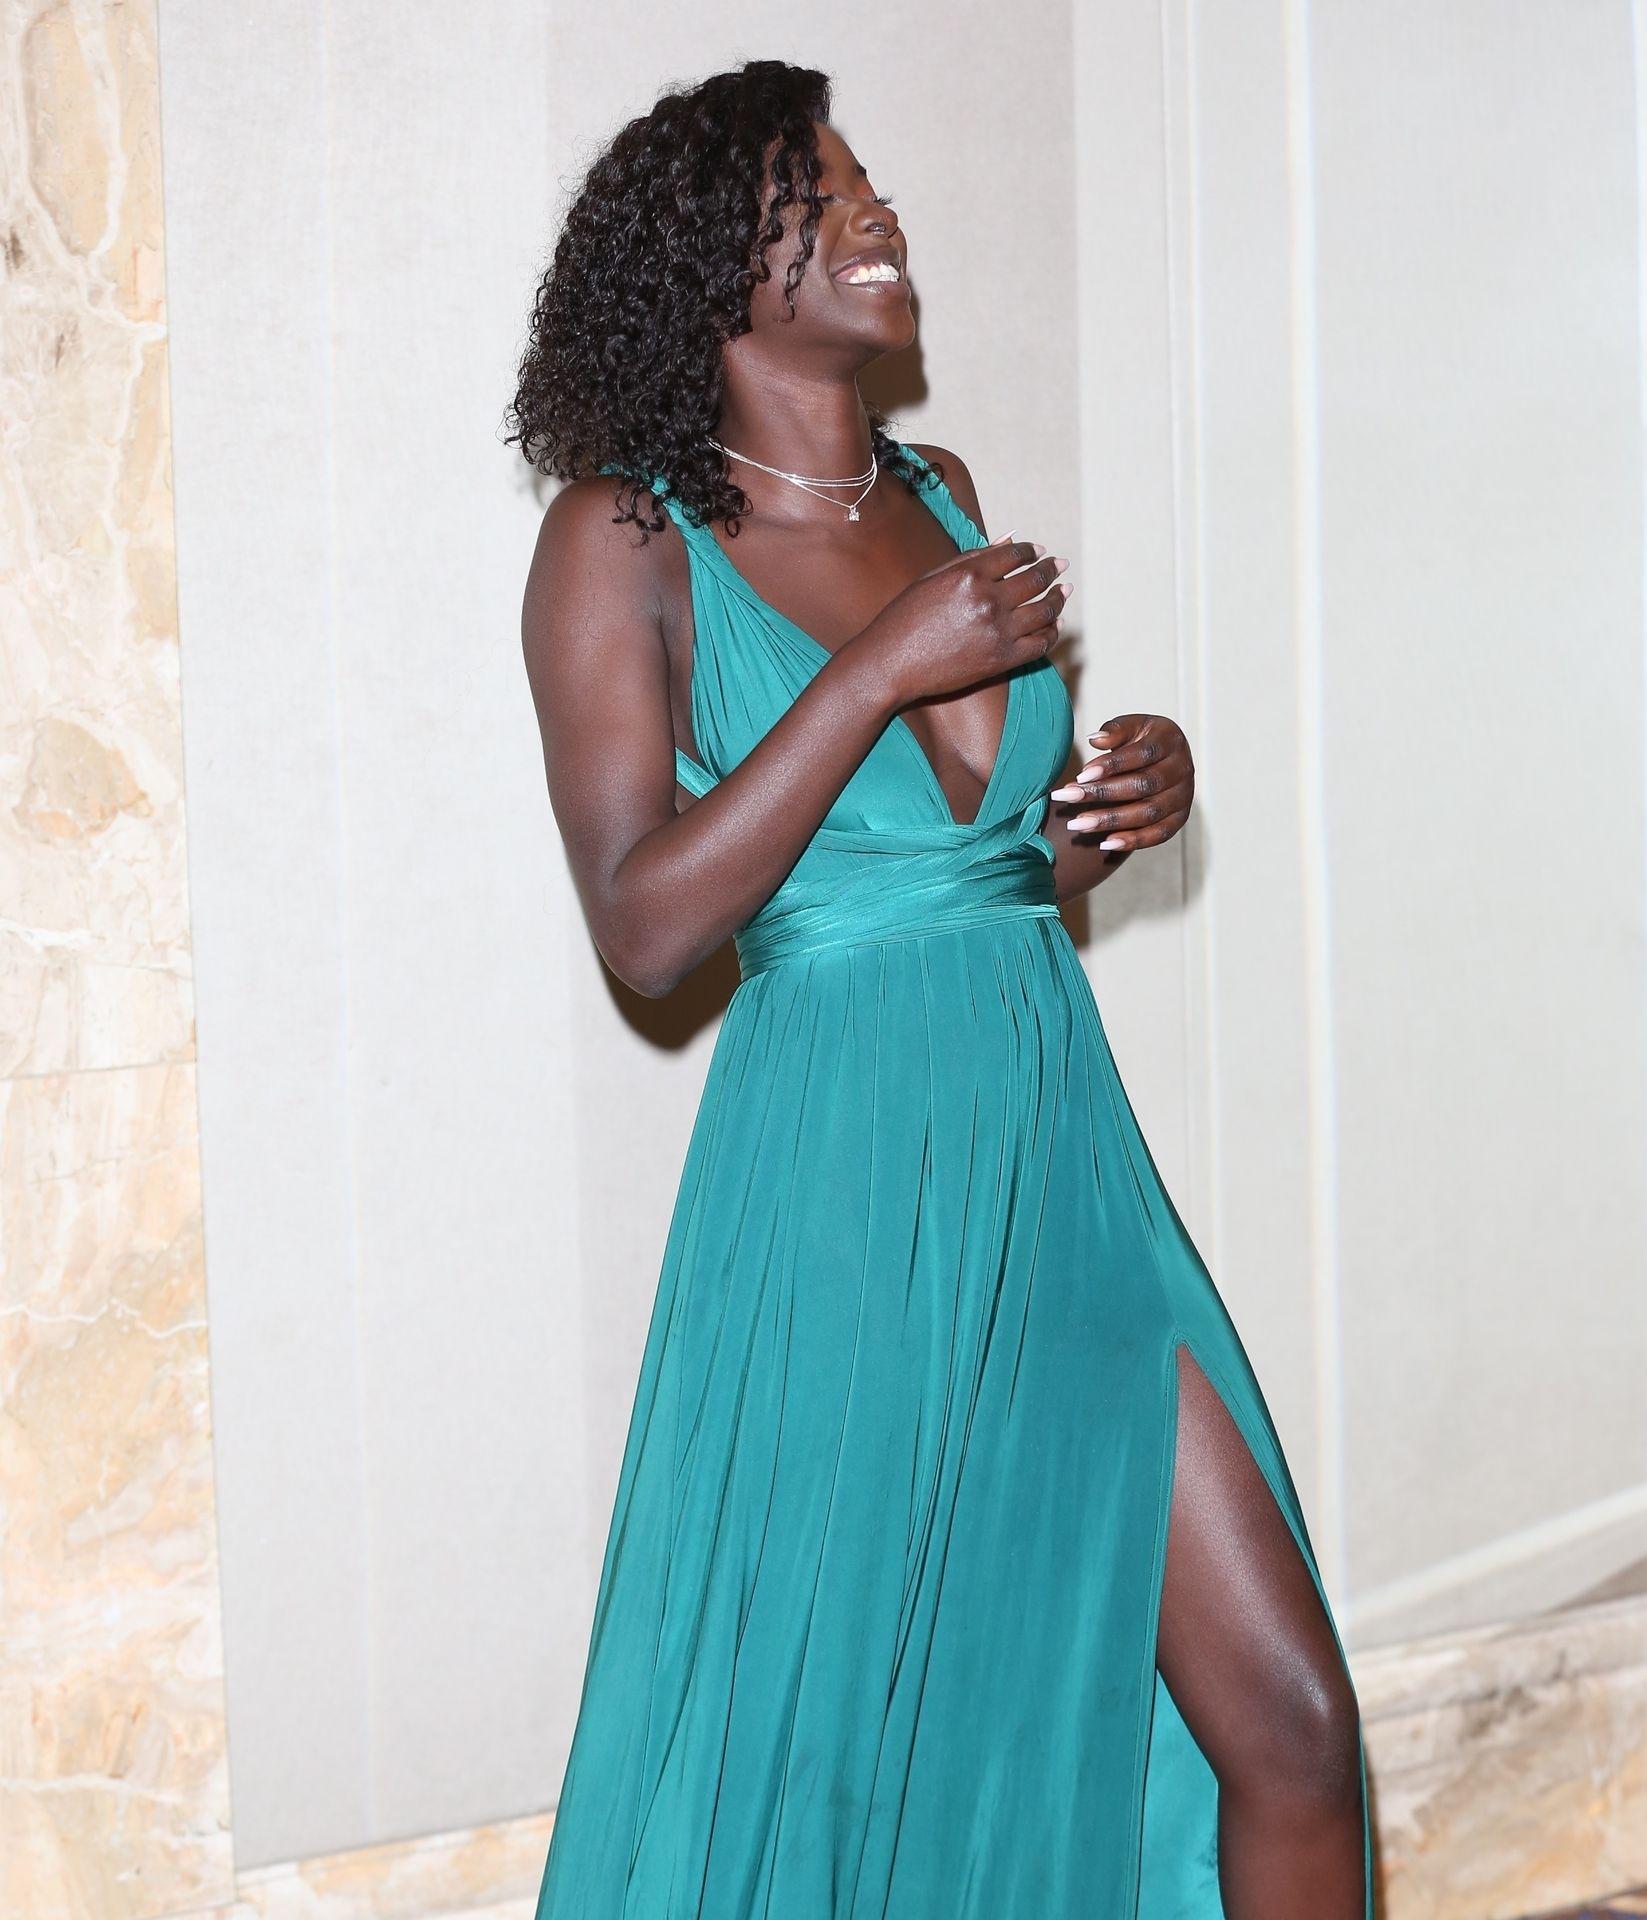 Mike Boateng & Priscilla Anyabu Are Seen At British Ethnic Diversity Sports Awards 0164